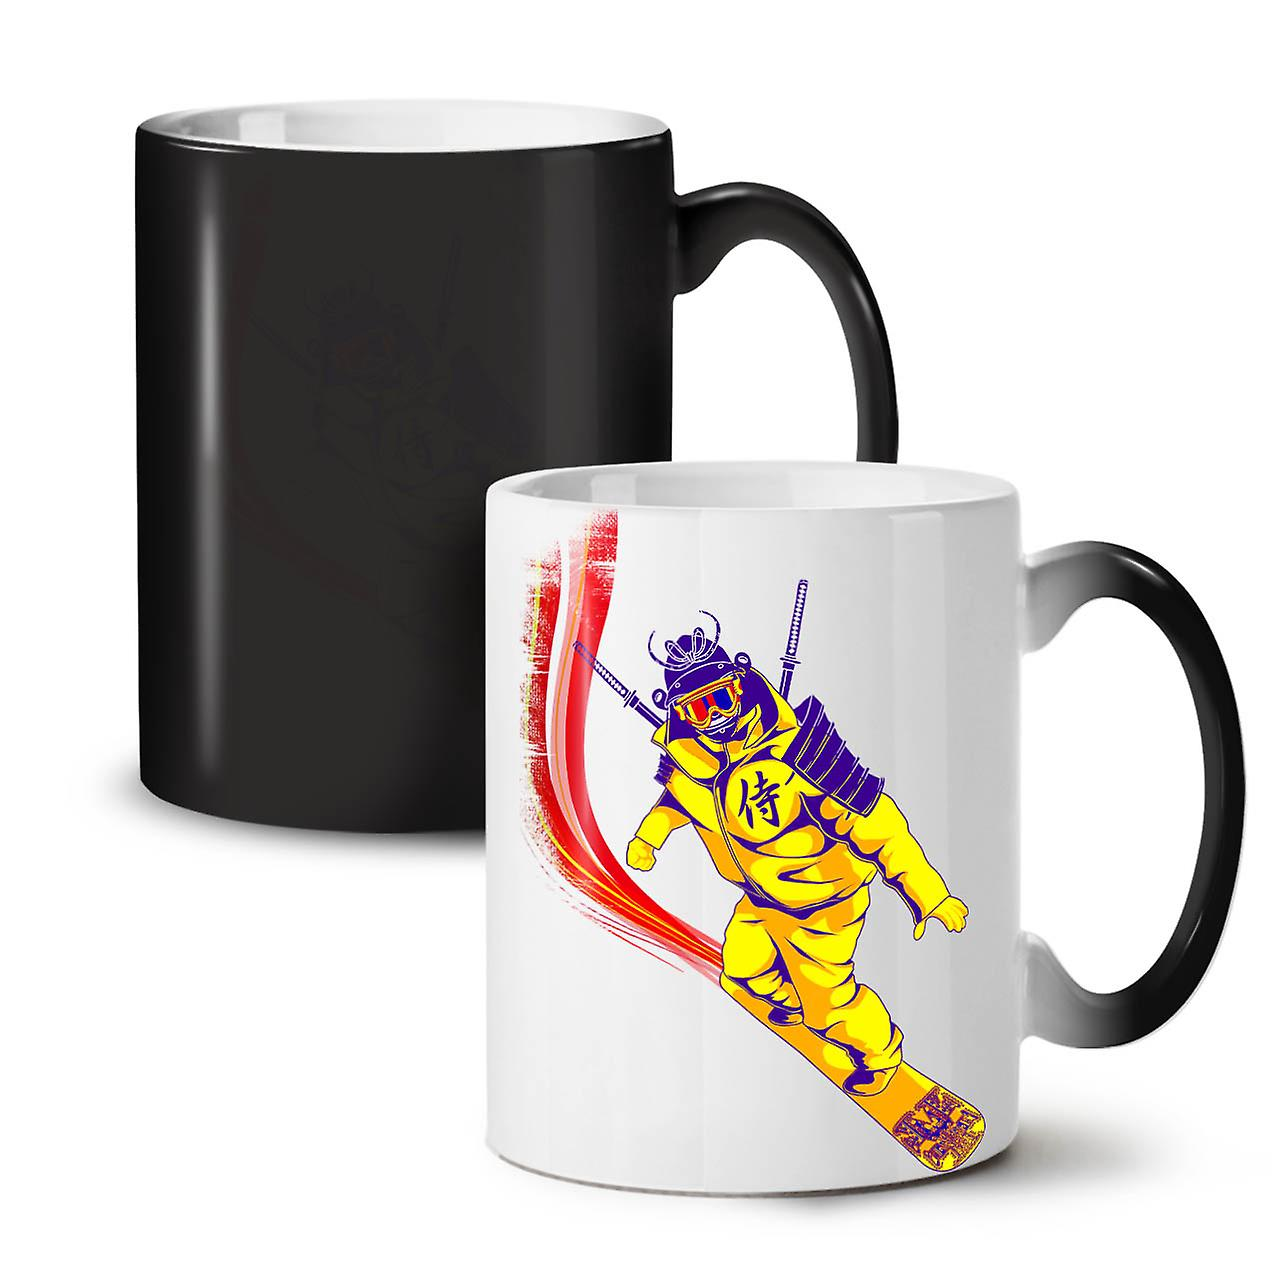 Snowboard Colour New Changing Coffee Tea Ceramic Black Katana 11 OzWellcoda Mug O8w0nPkX